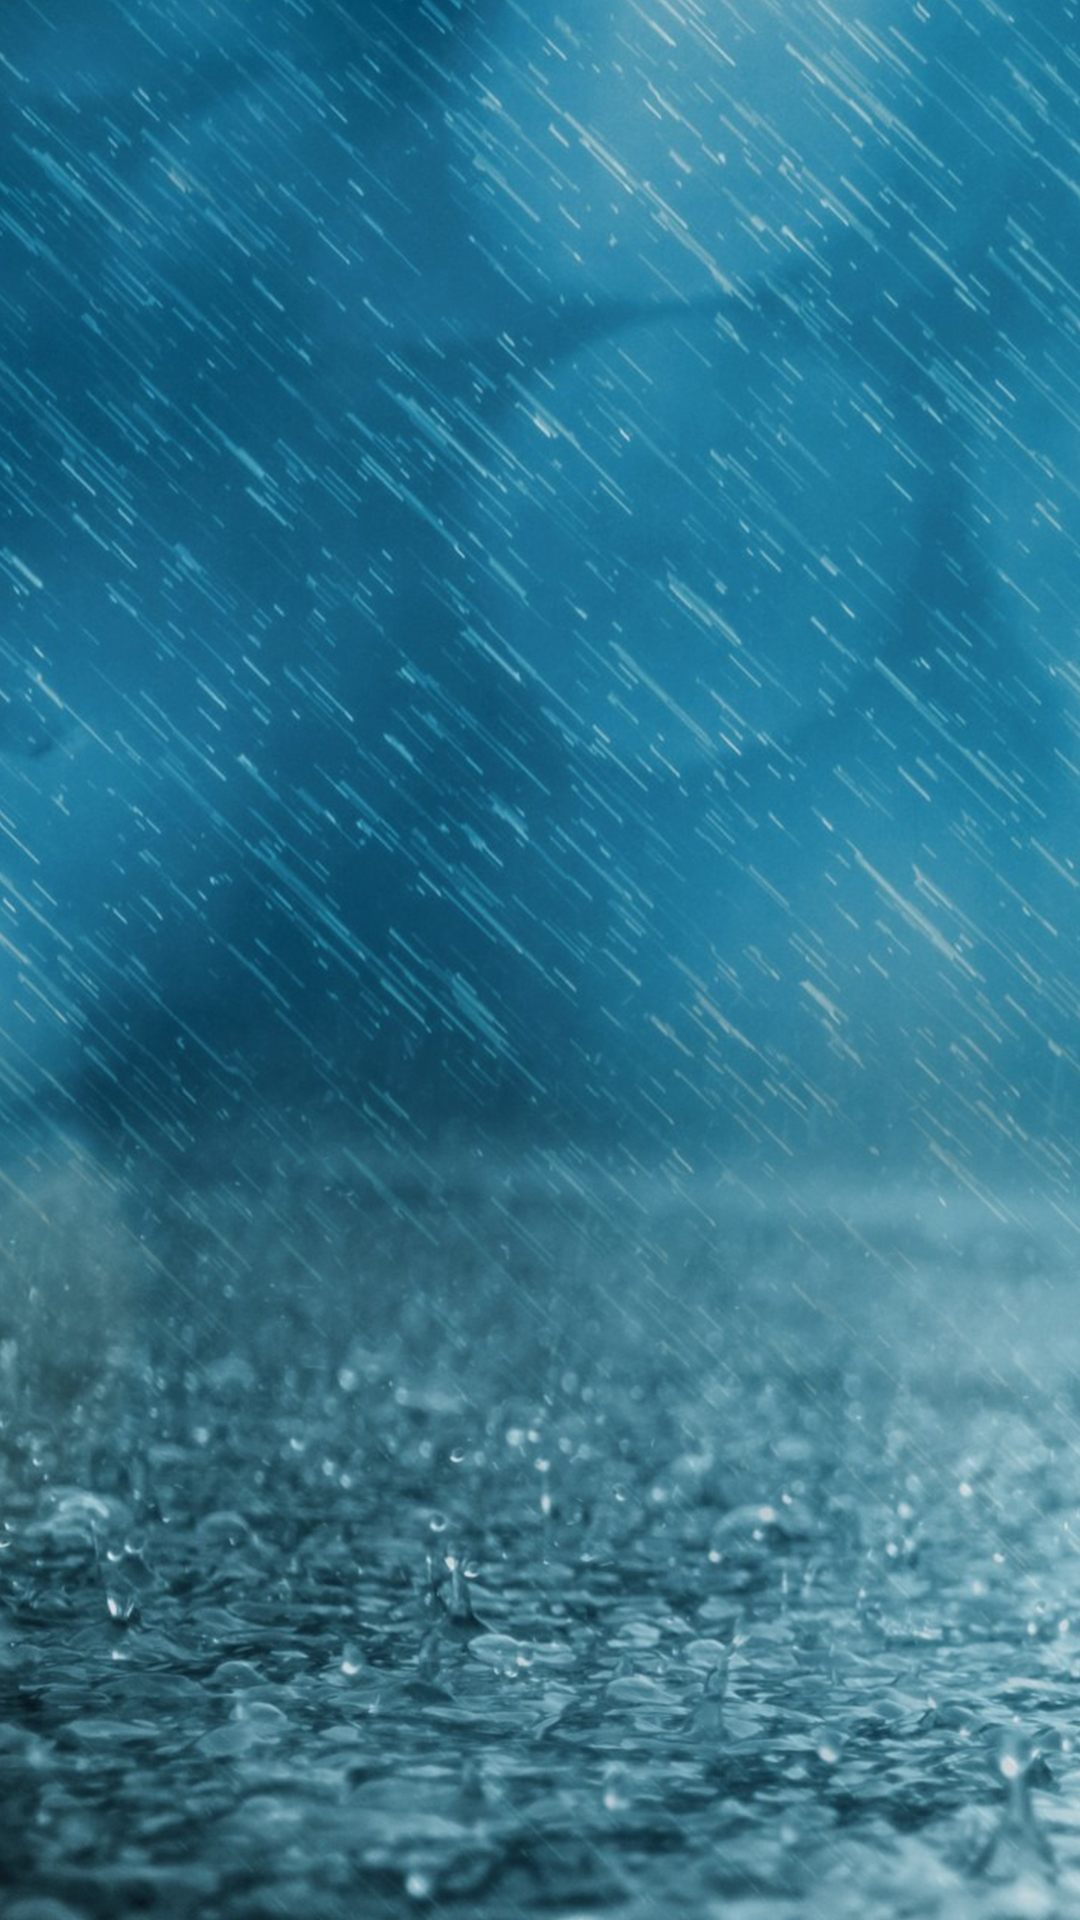 Free Hd Blue Rain Phone Wallpaper6651